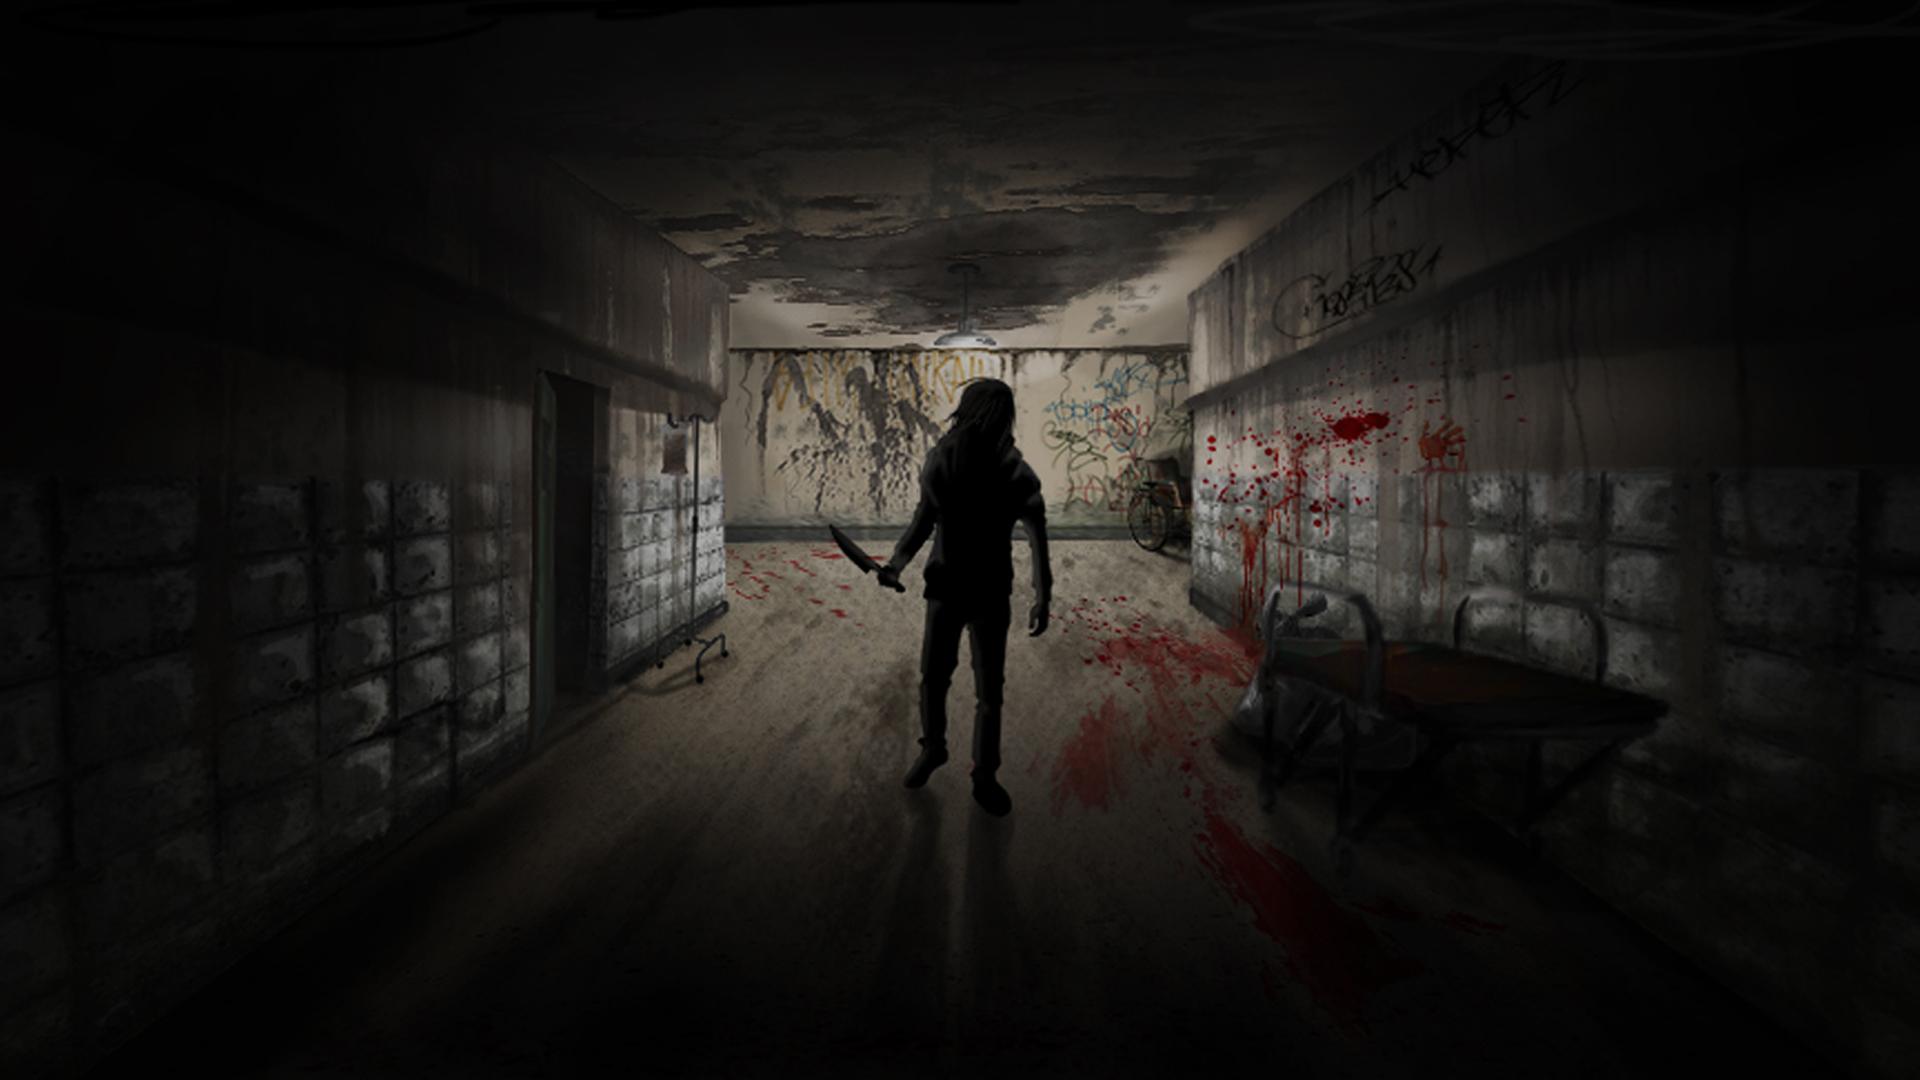 Love Killer Hd Wallpaper : Jeff The Killer Asylum images